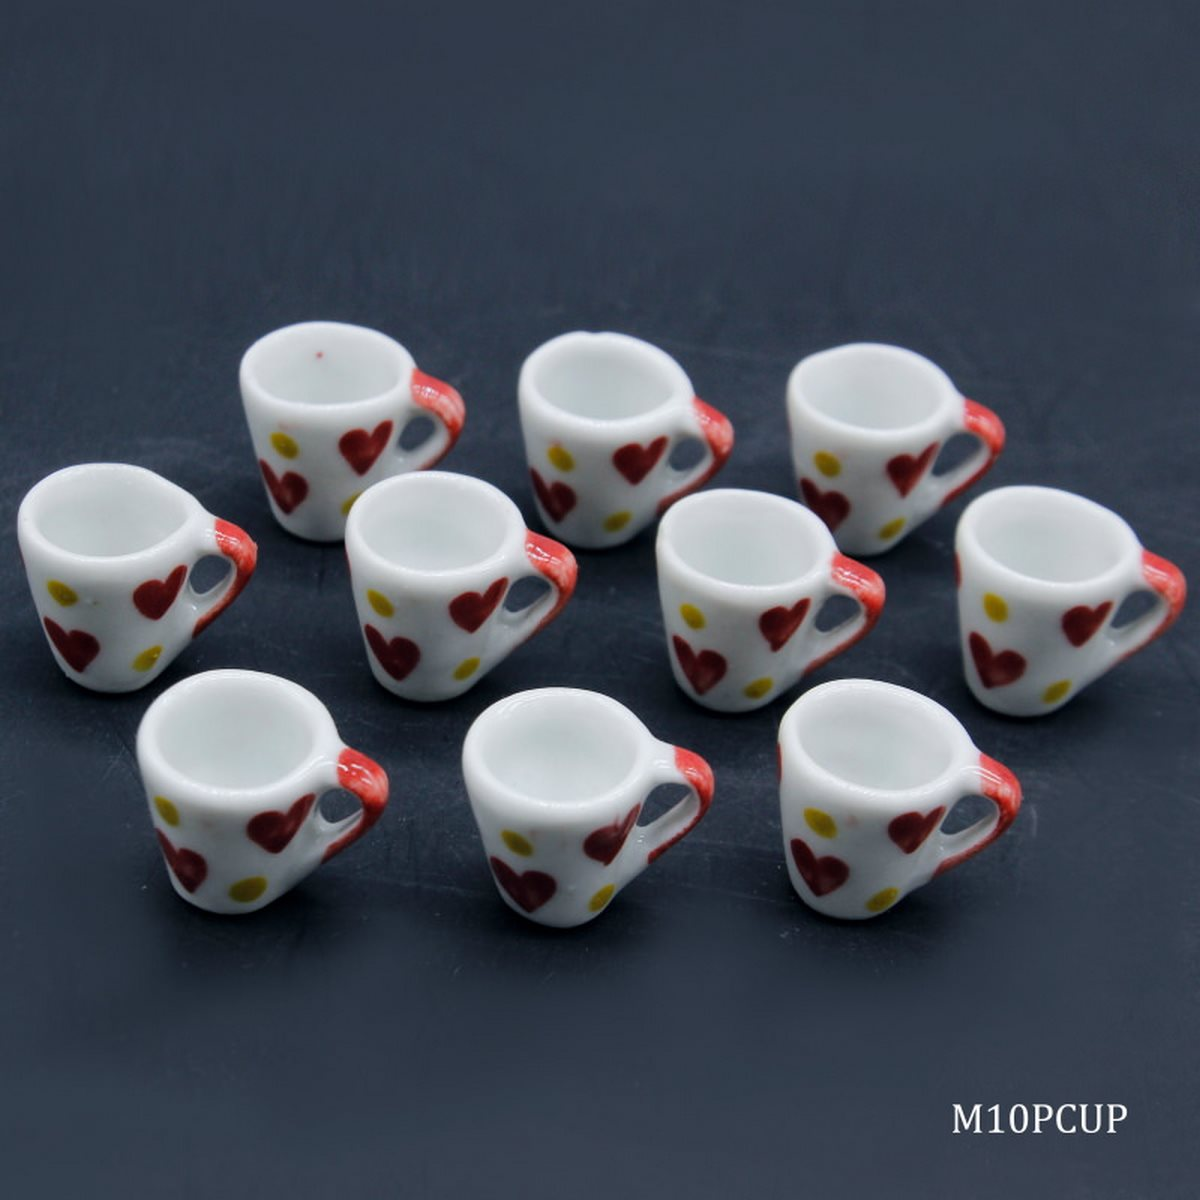 Miniature Ceramic Cup